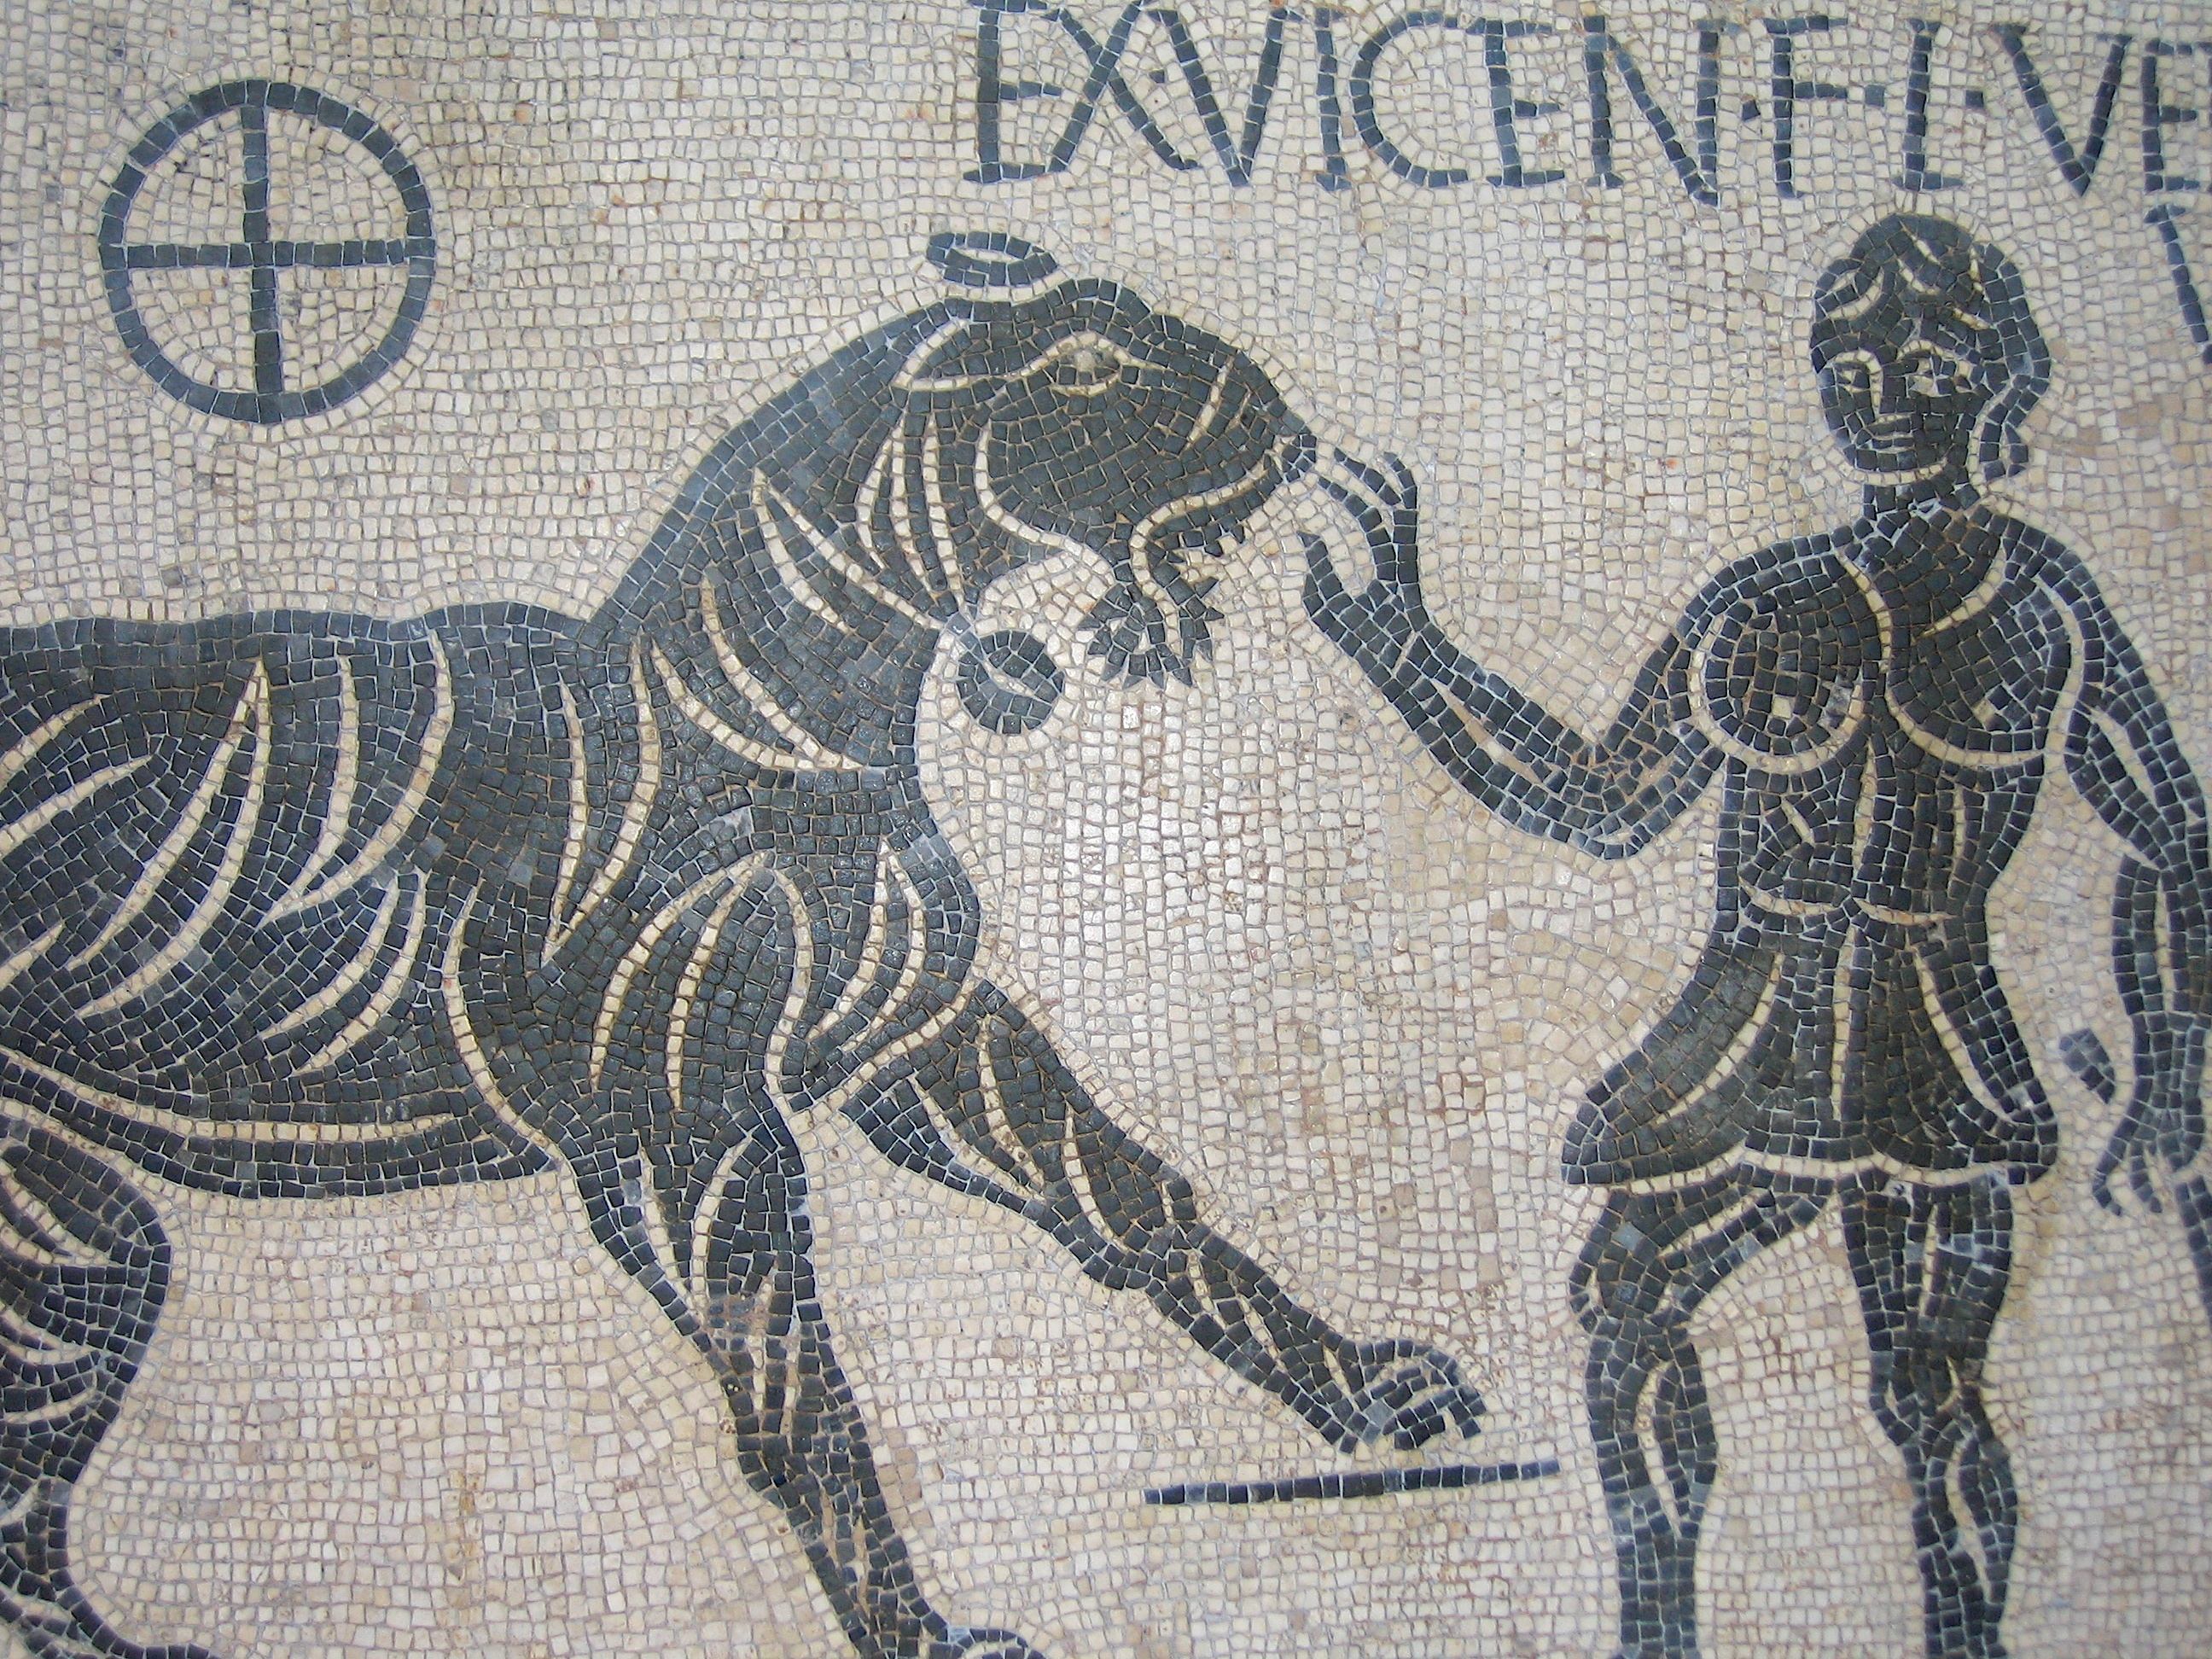 Roman gladiator, slavery, slaves